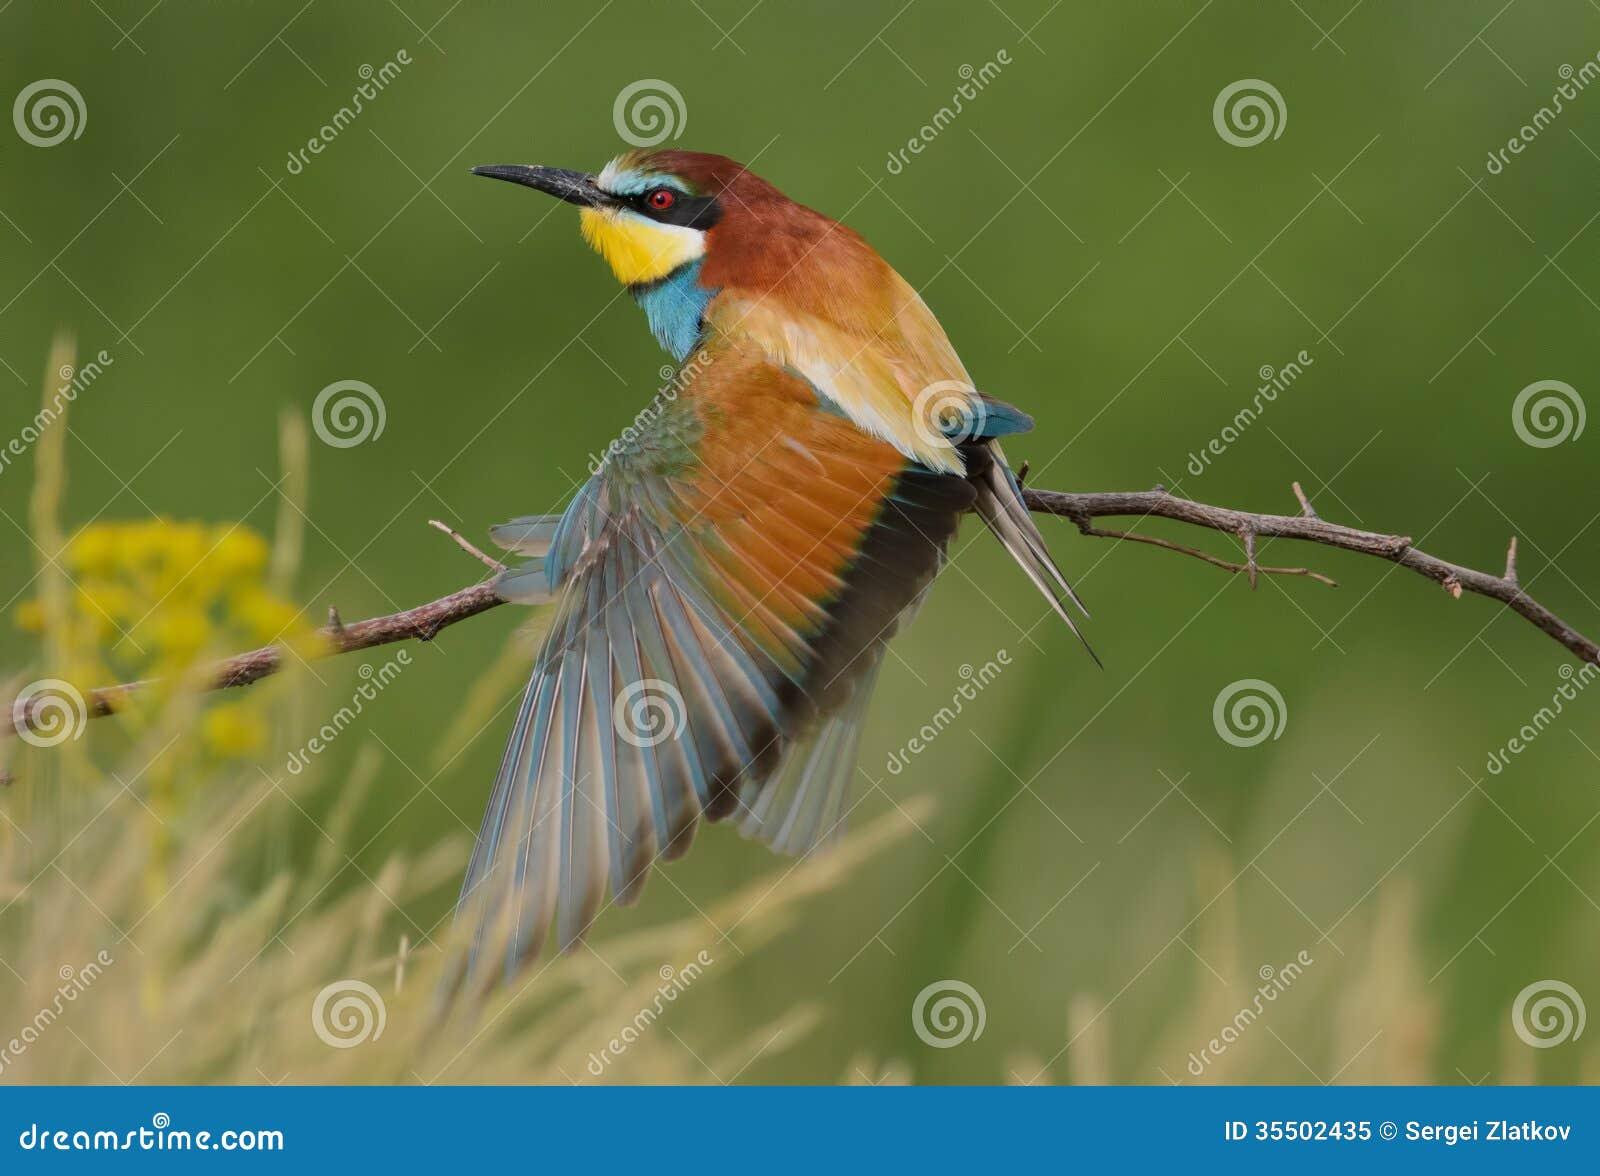 (Merops apiaster